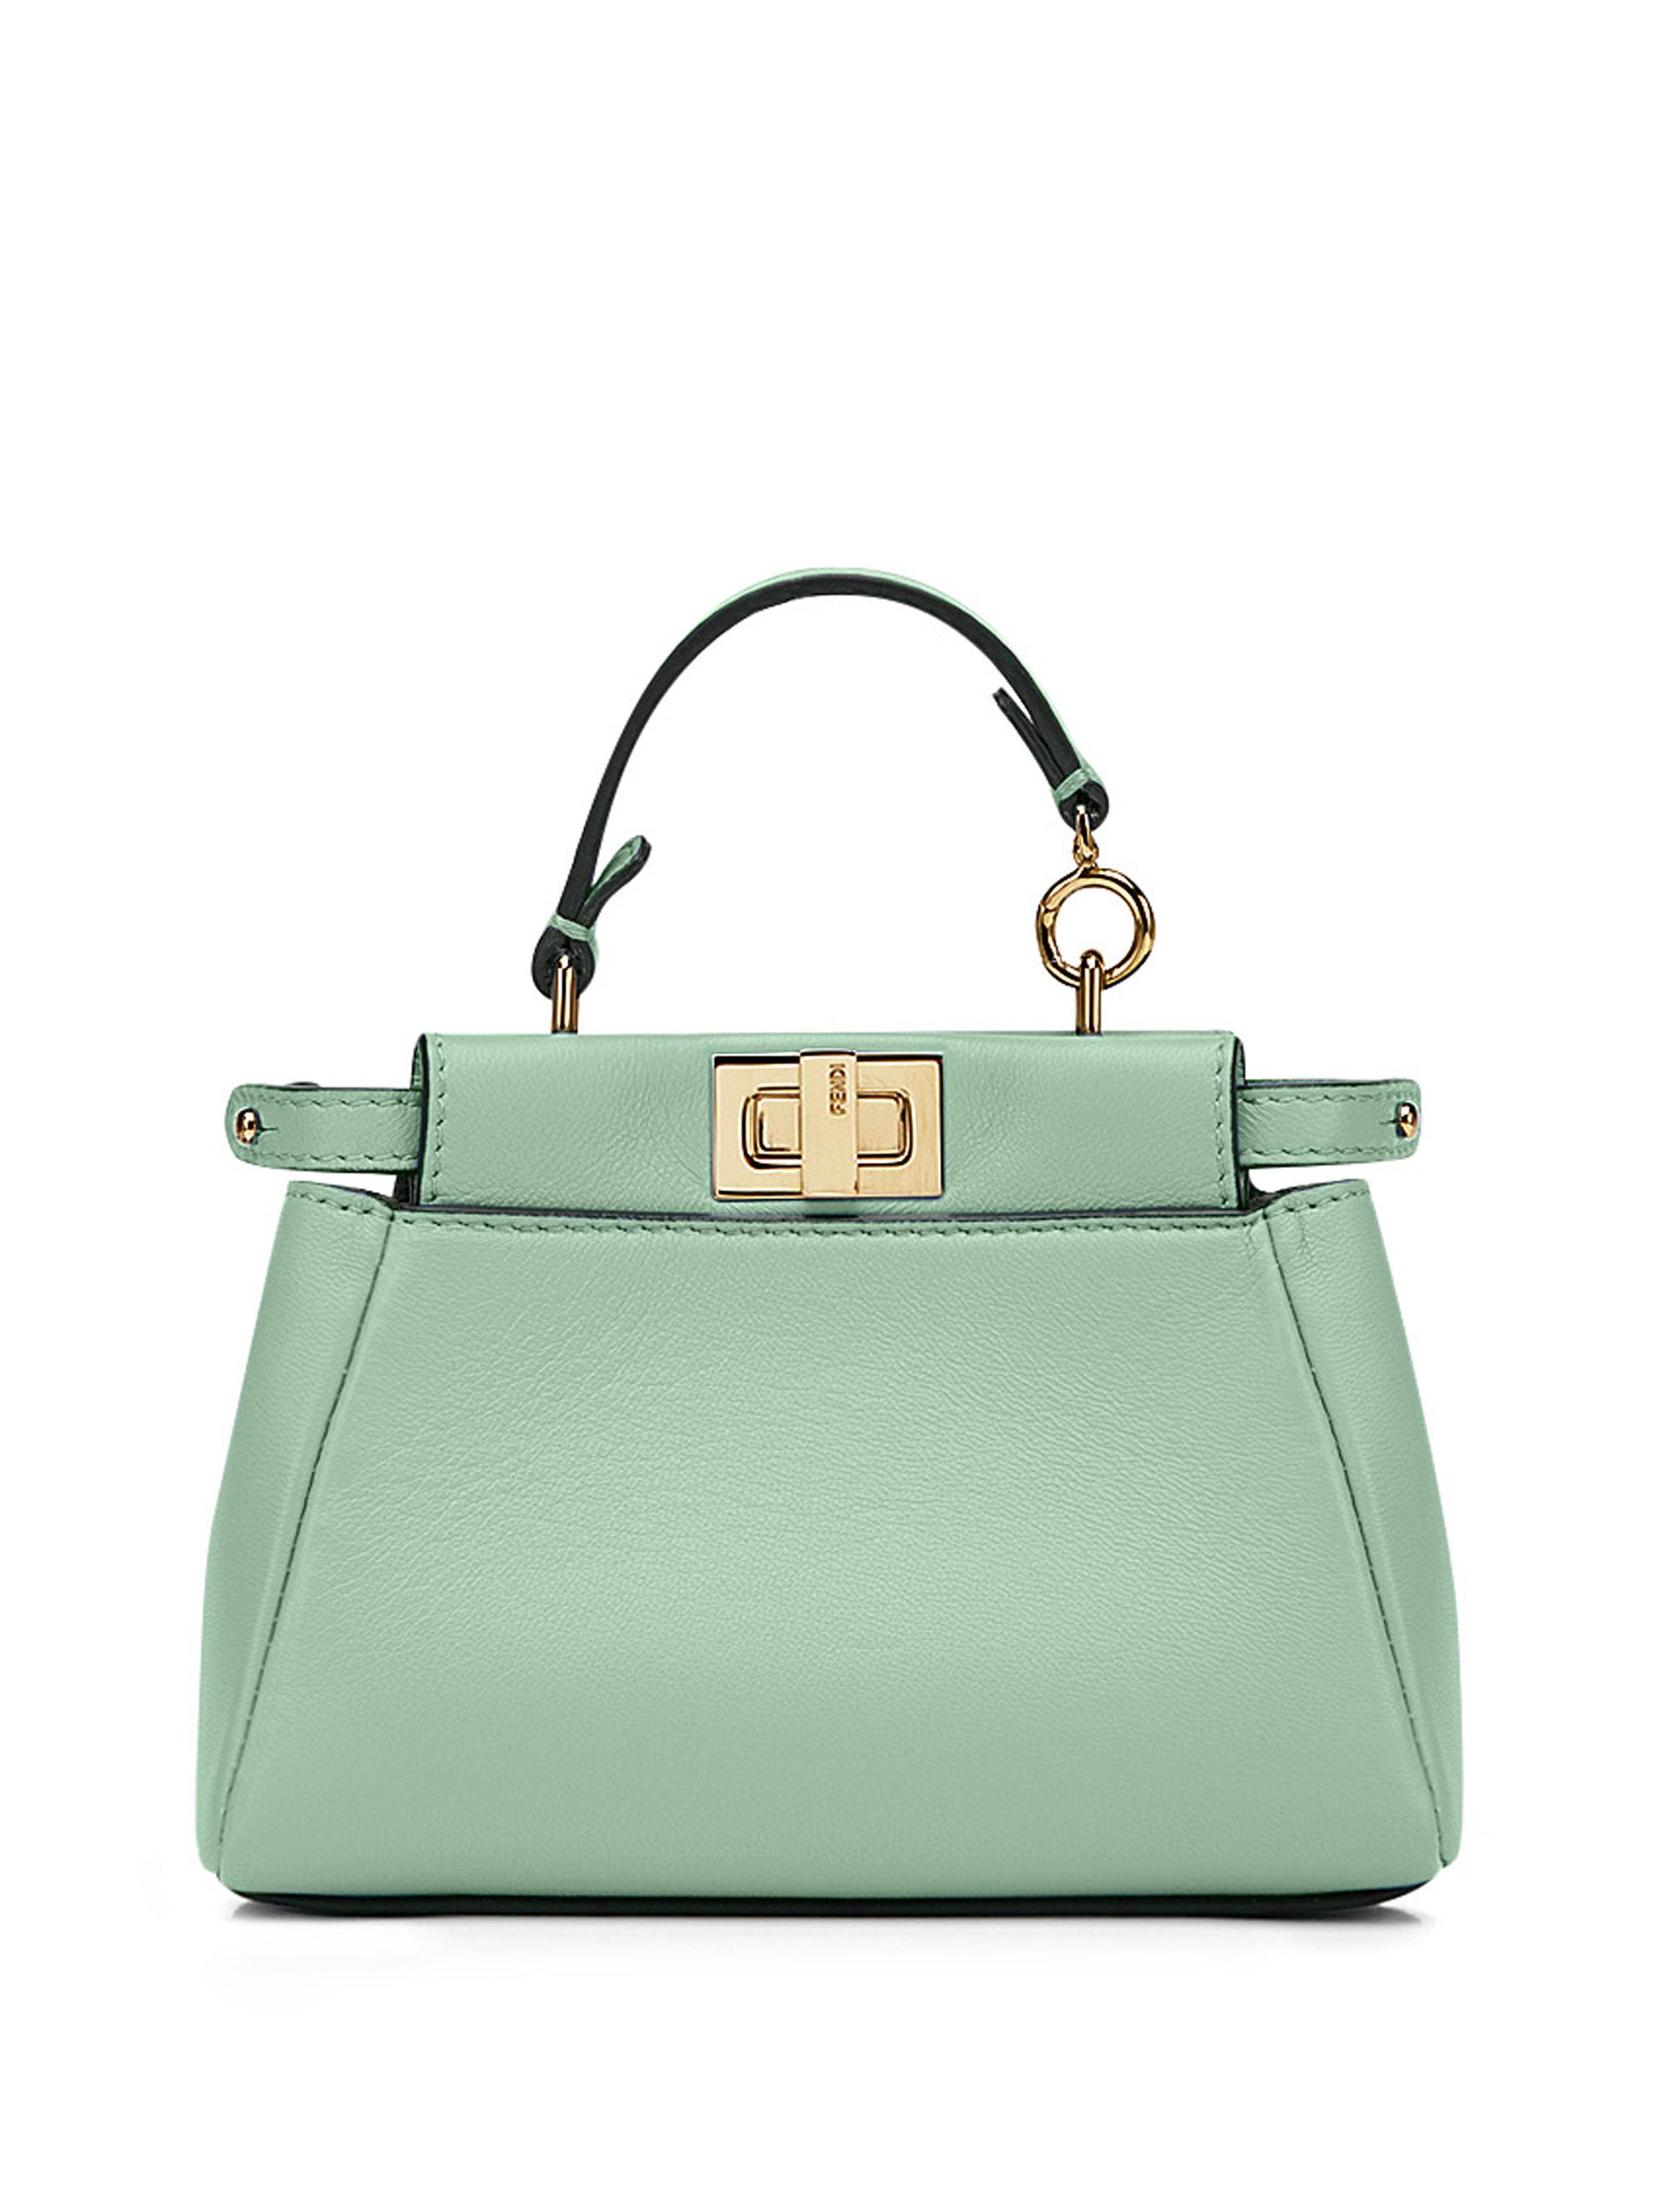 8c134a7cc9a6 fendi online store - Fendi Peekaboo Micro Leather Satchel in Green (lime)